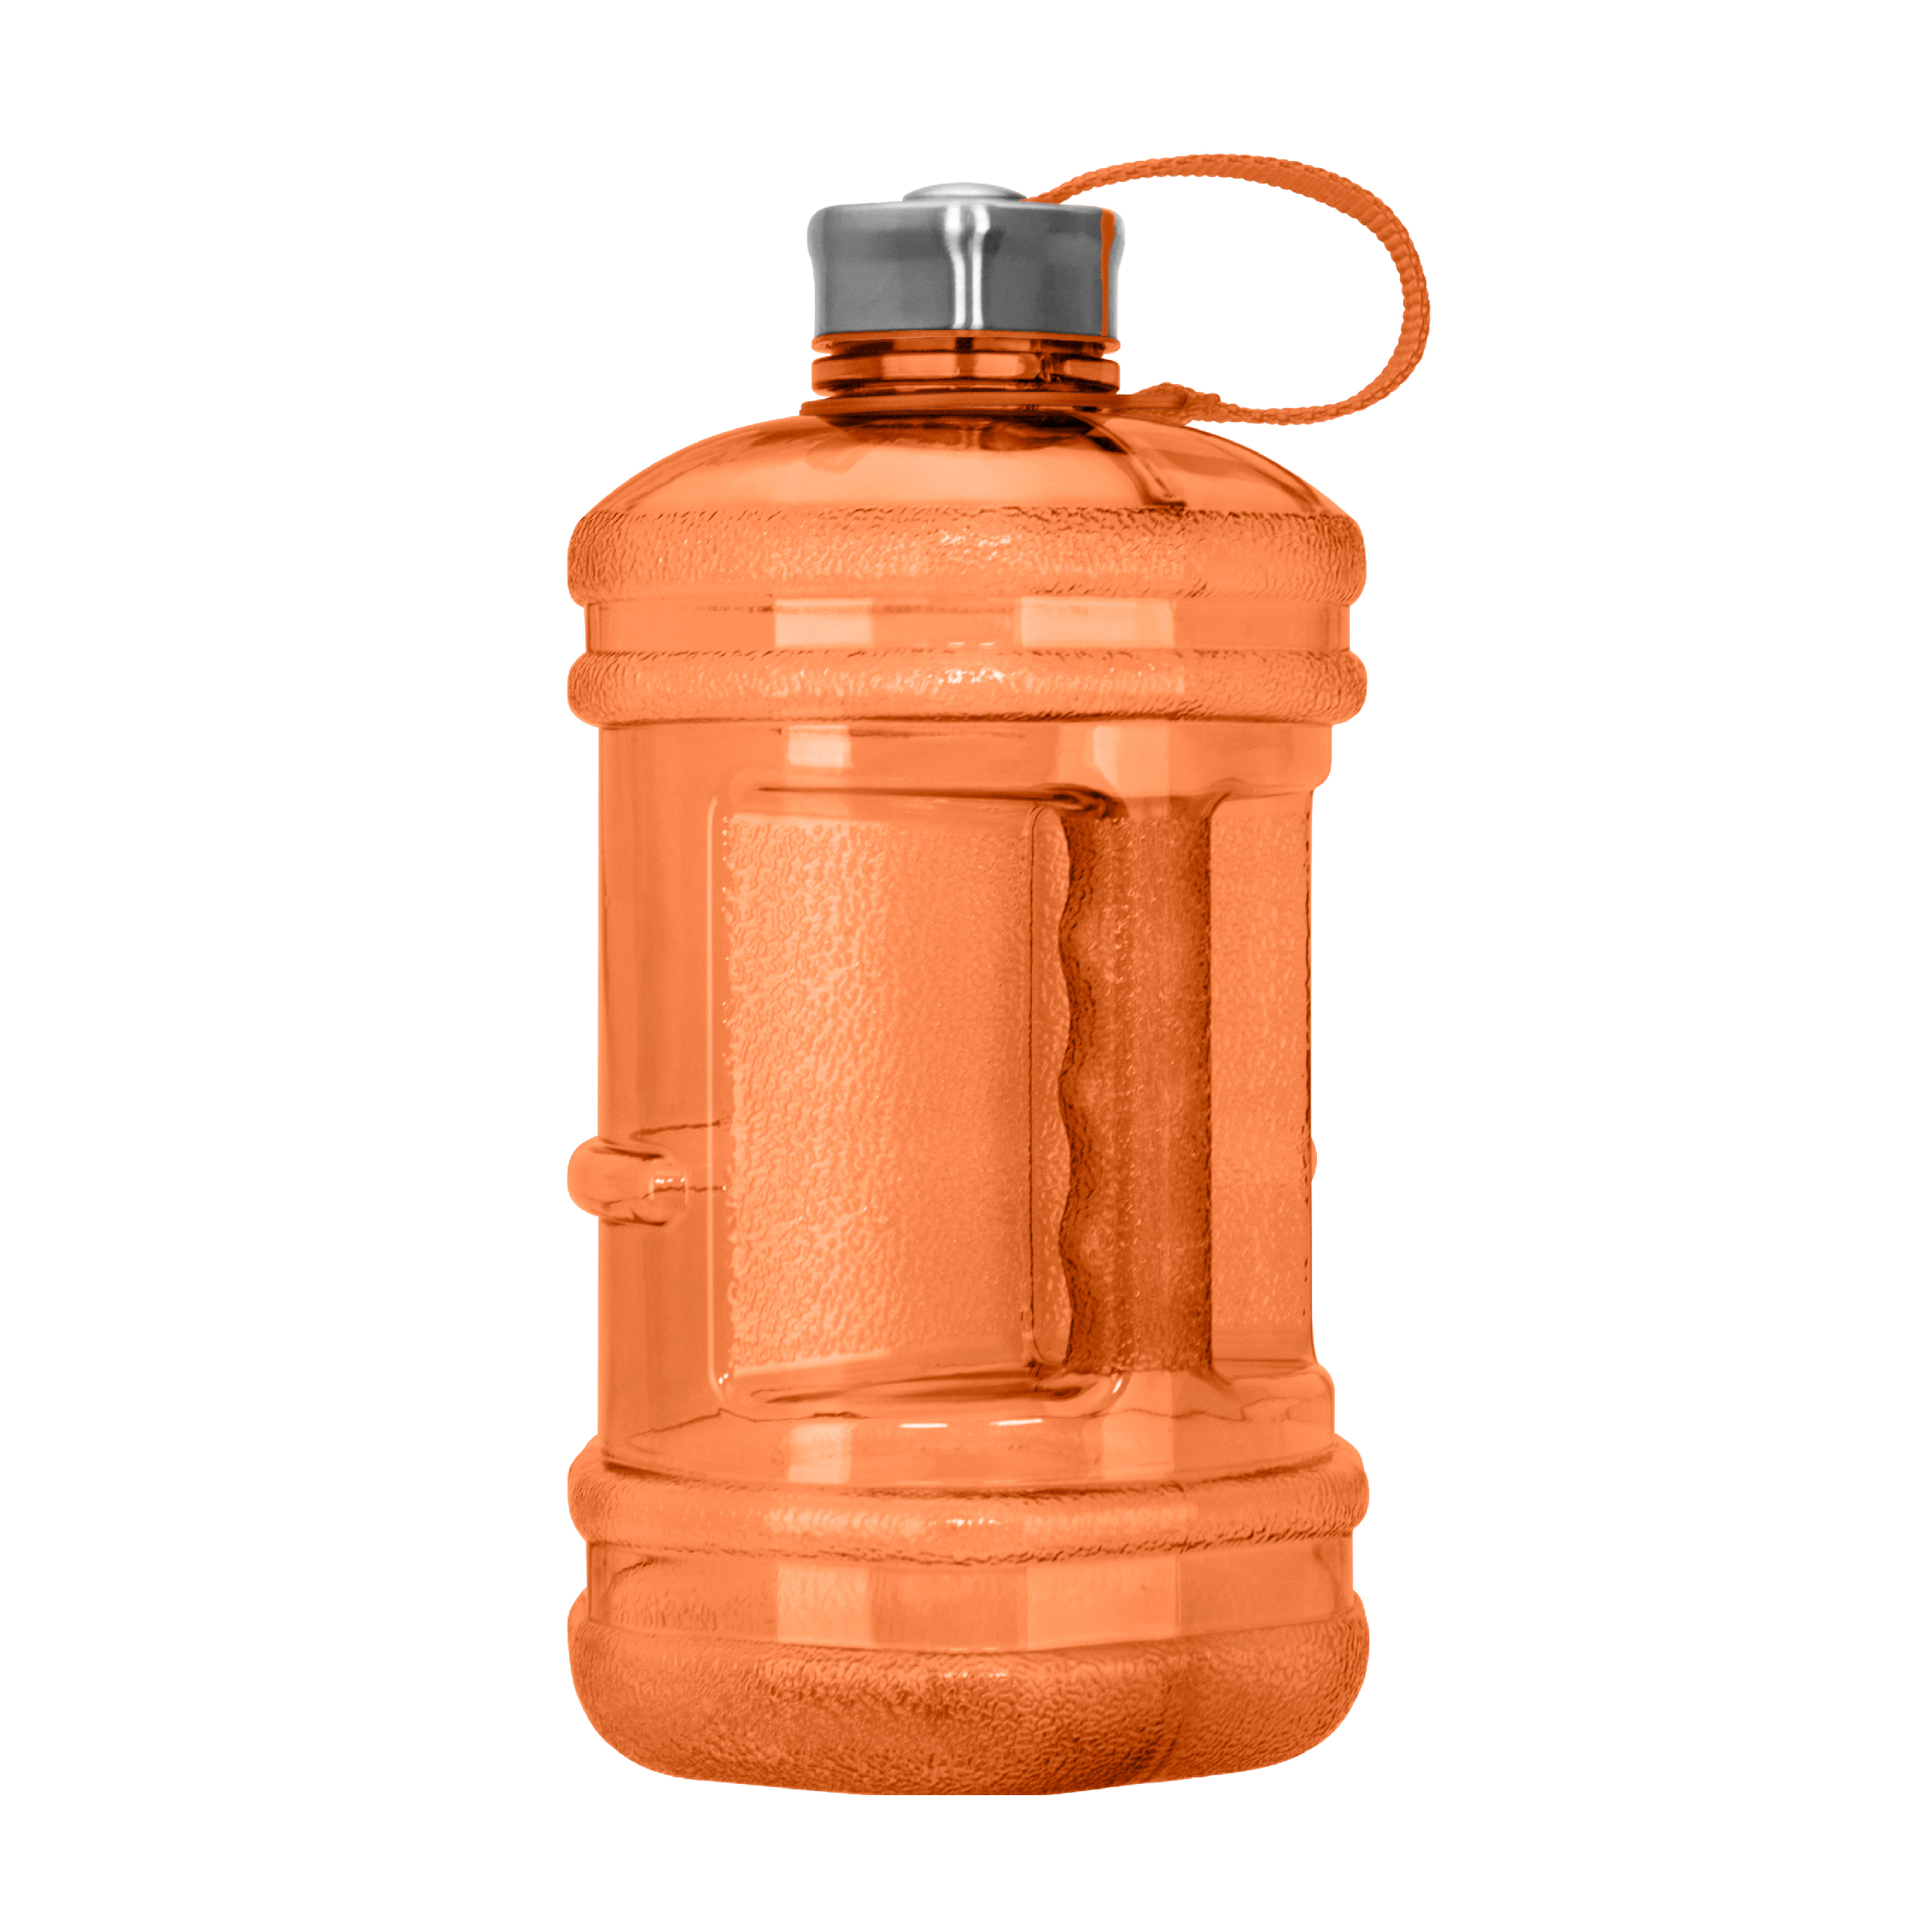 2.3 Liter BPA Free Reusable Plastic Drinking Water Bottle w/ Steel Cap